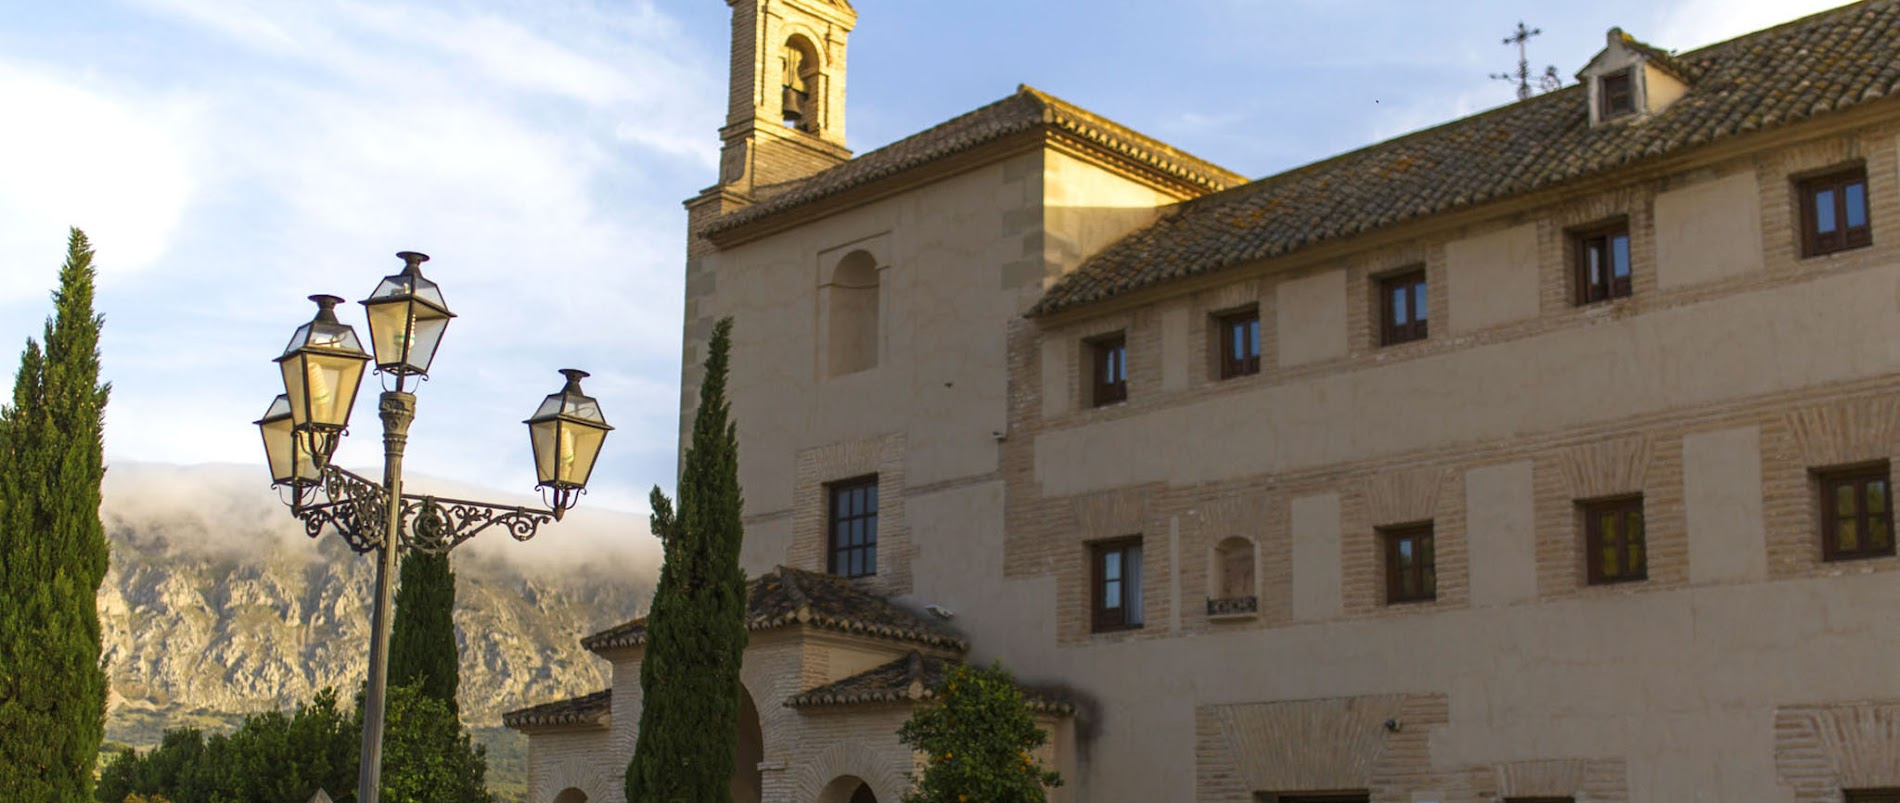 Convento La Magdalena By Checkin ***** | Web Oficial | Antequera, Málaga